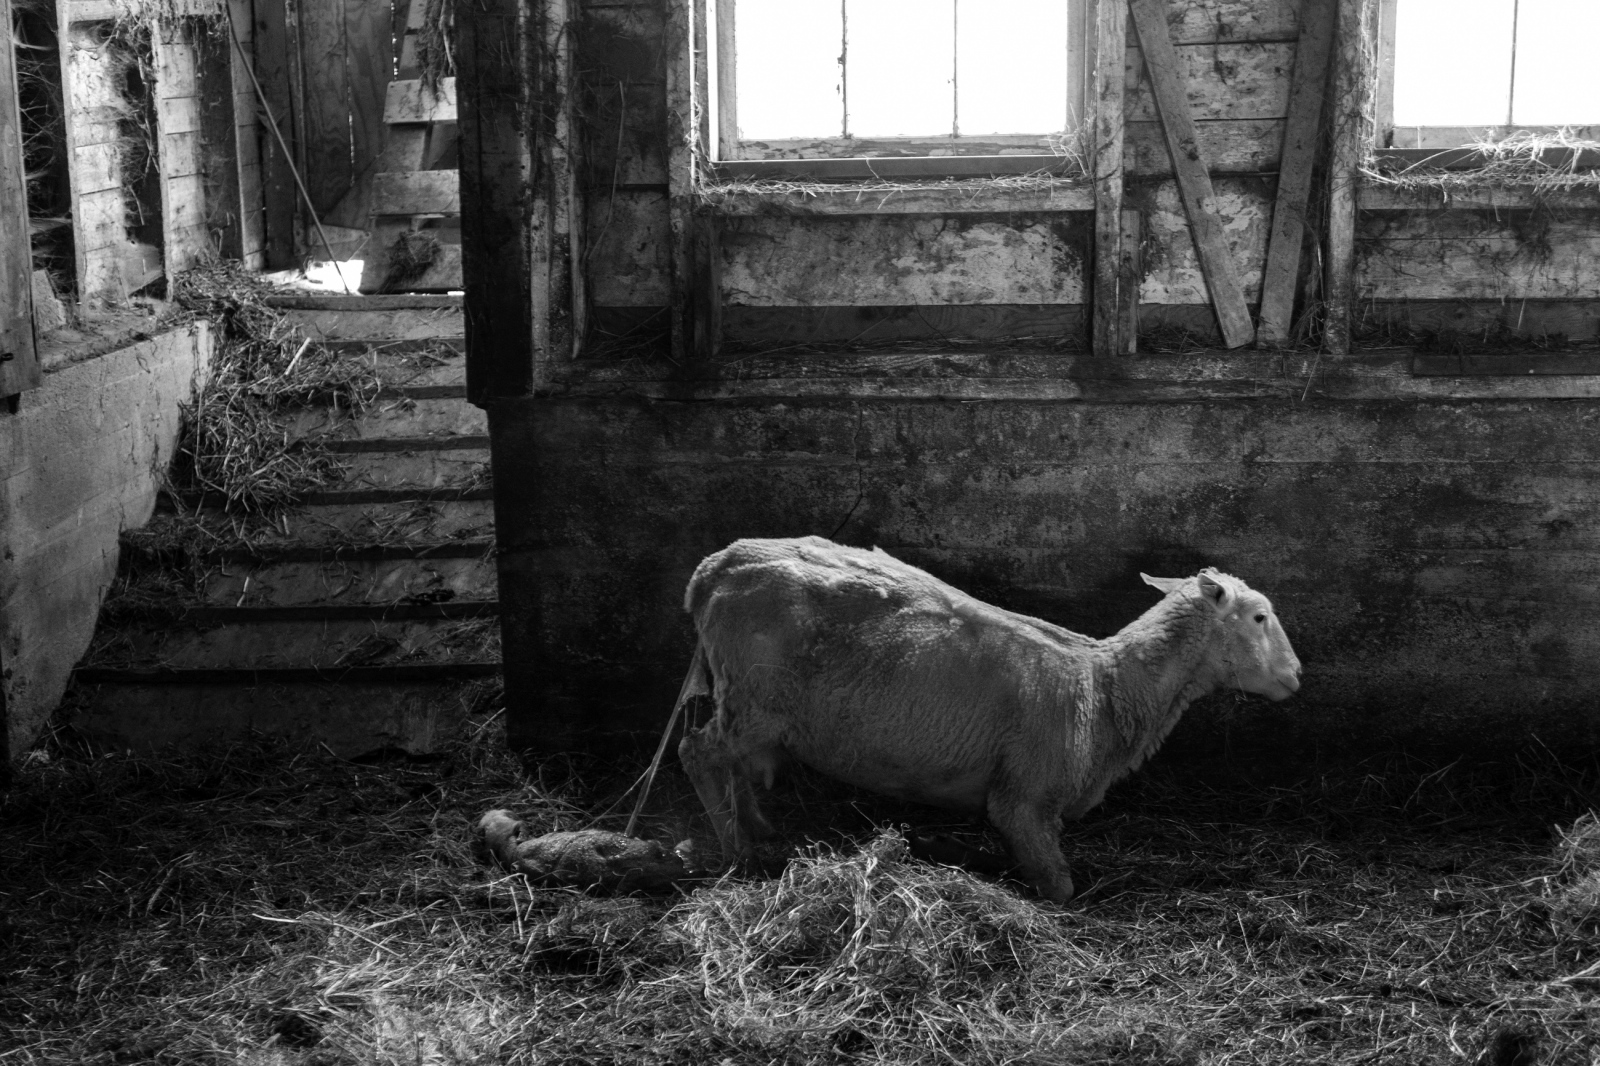 Lambing begins